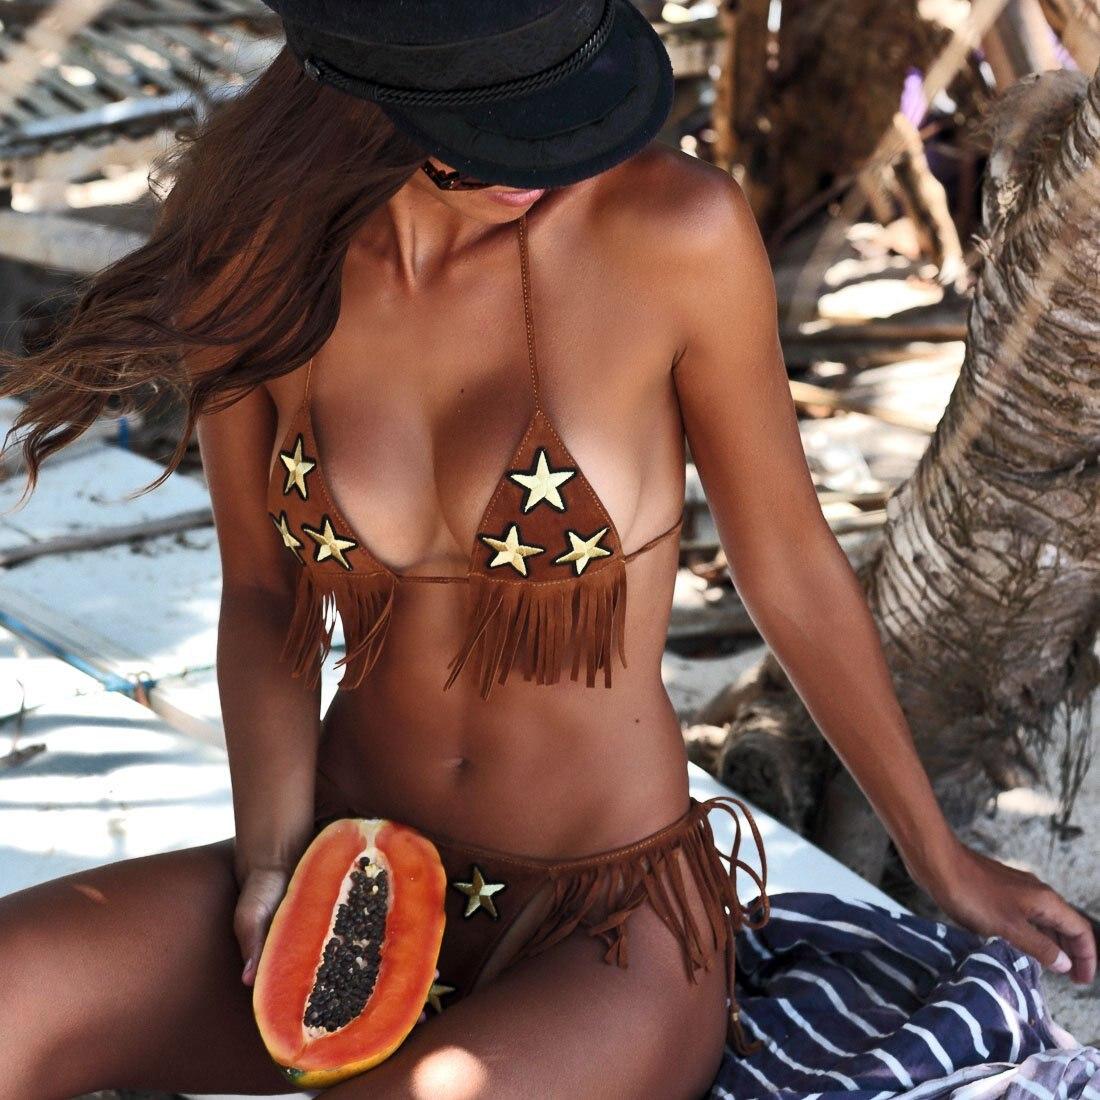 outlaw_bikini_tan_madeleineand